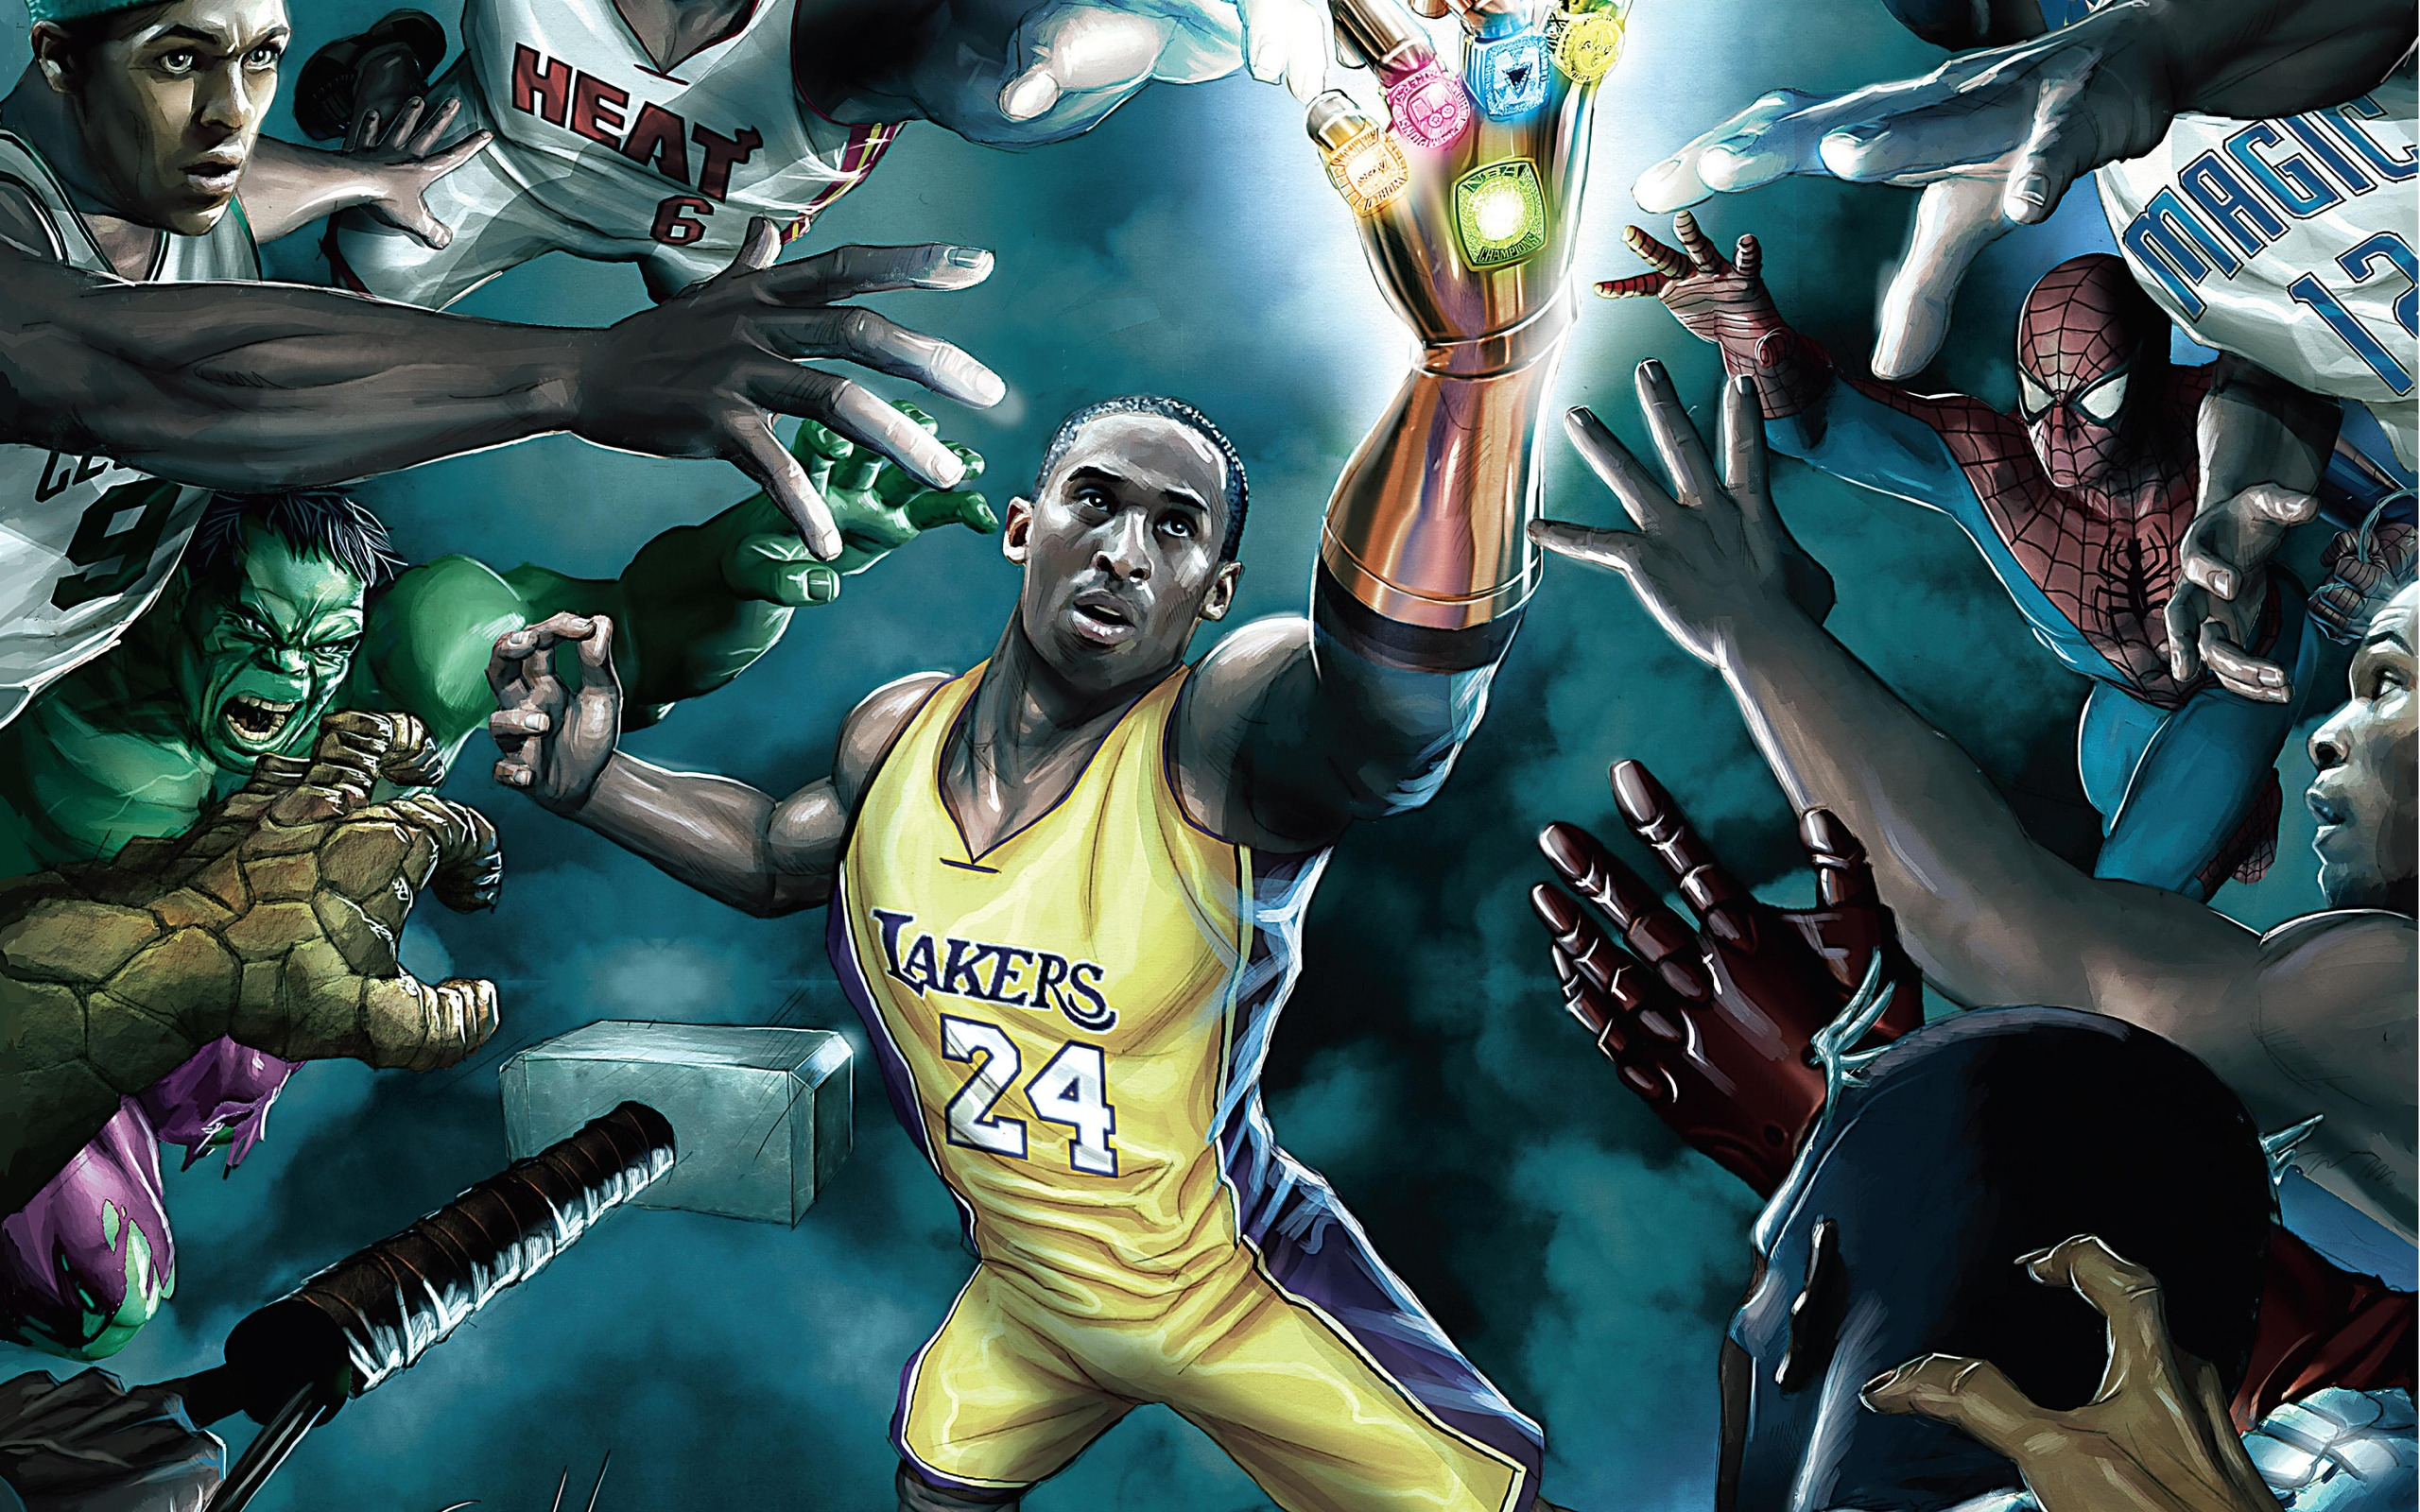 Los Angeles Iphone X Wallpaper Los Angeles Lakers Full Hd Fondo De Pantalla And Fondo De